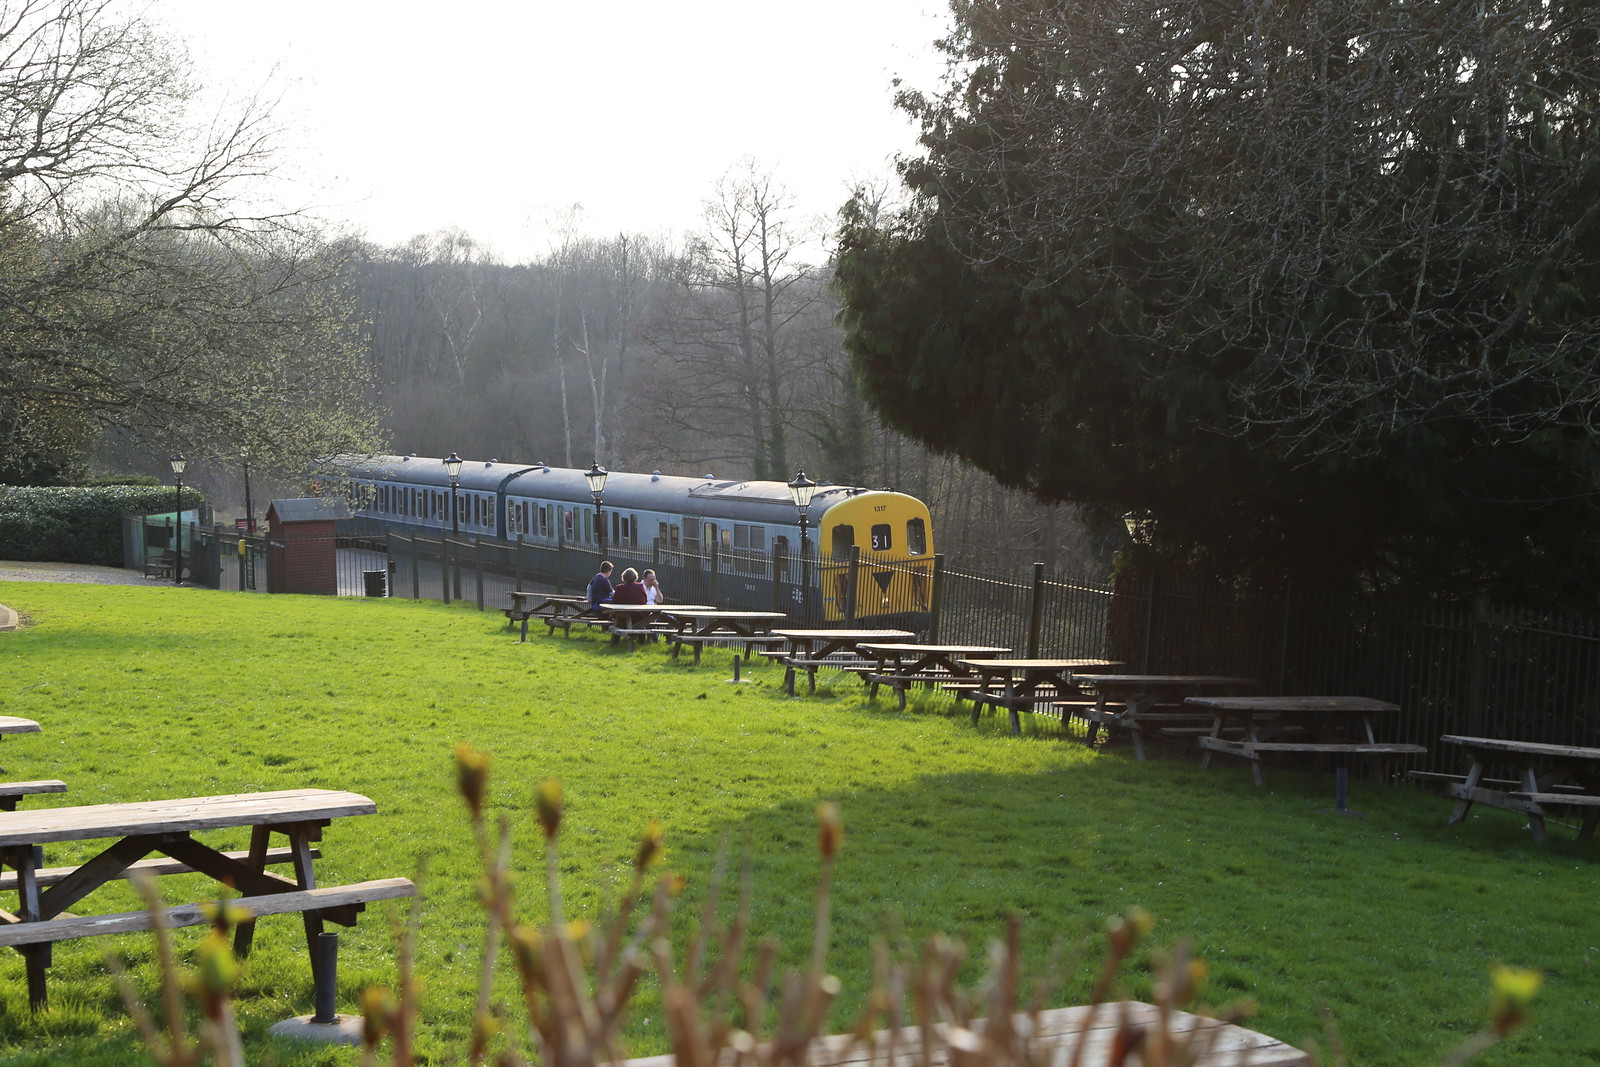 Spa Valley Railway train passing High Rocks